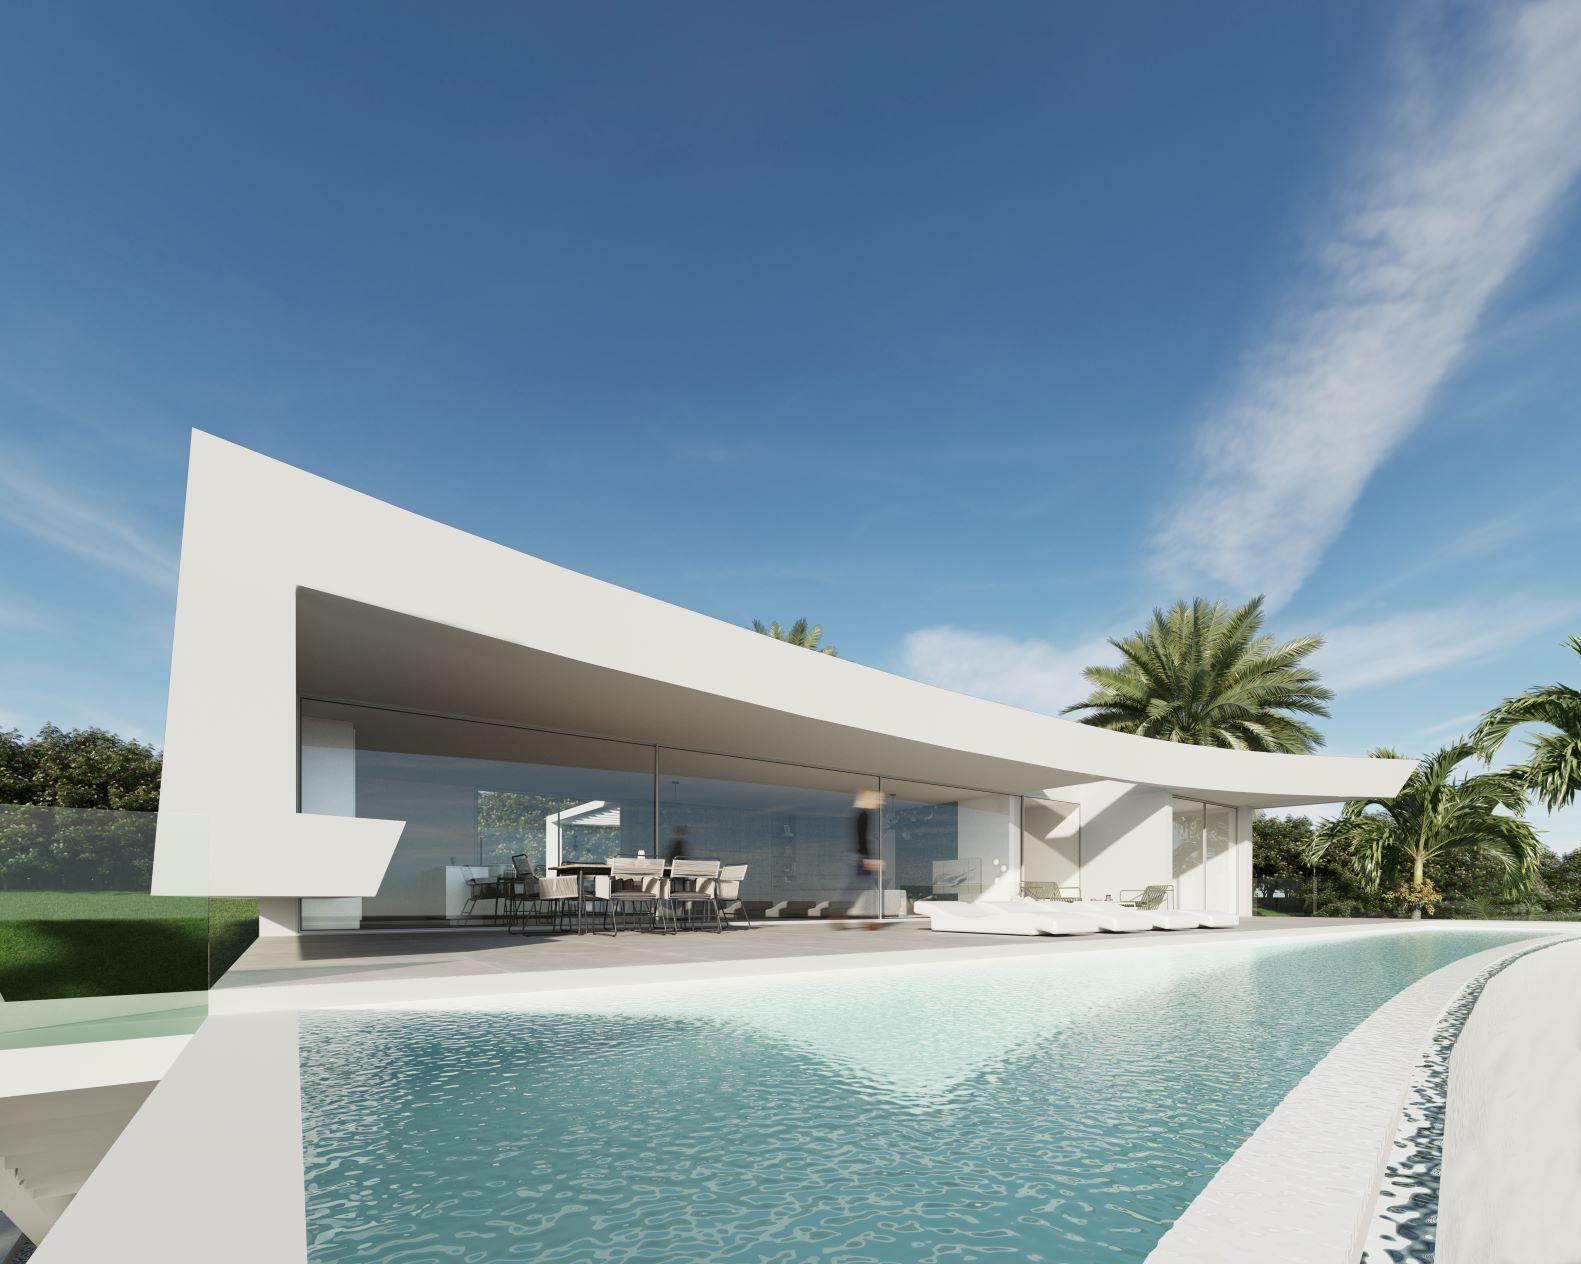 Sectacular modern villa with seaviews